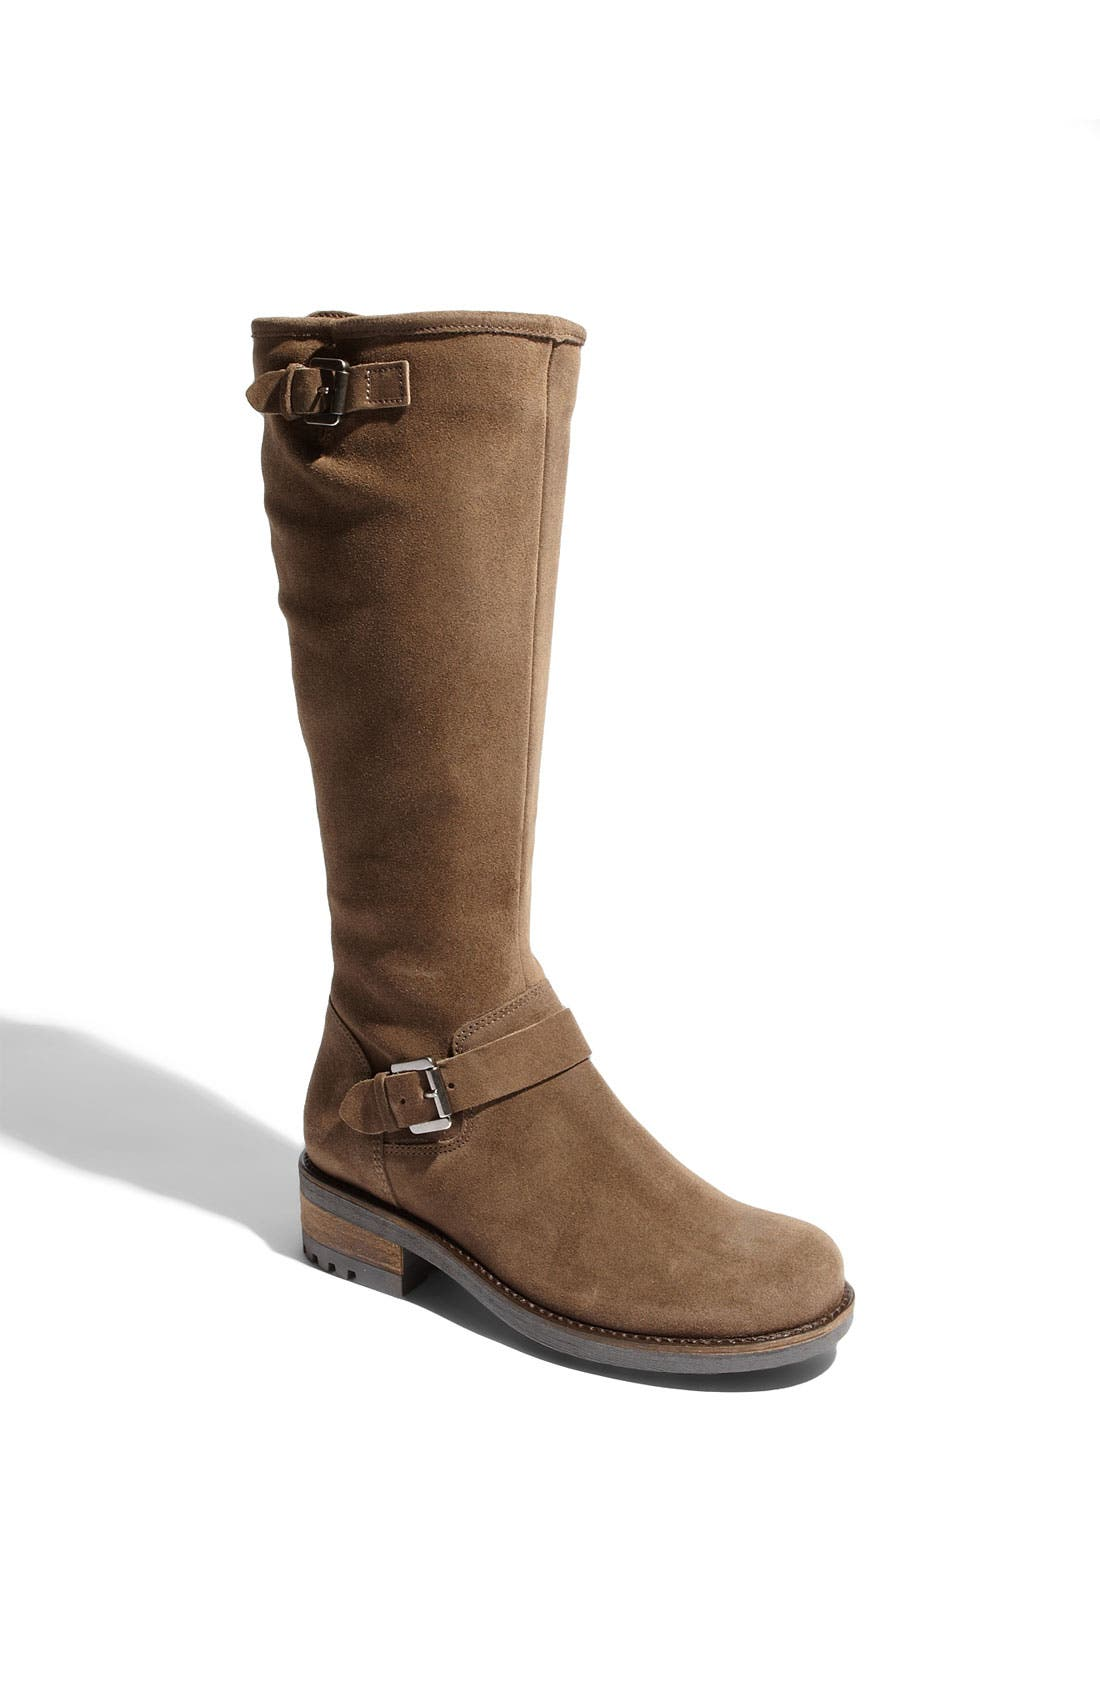 Main Image - La Canadienne 'Caleb' Waterproof Boot